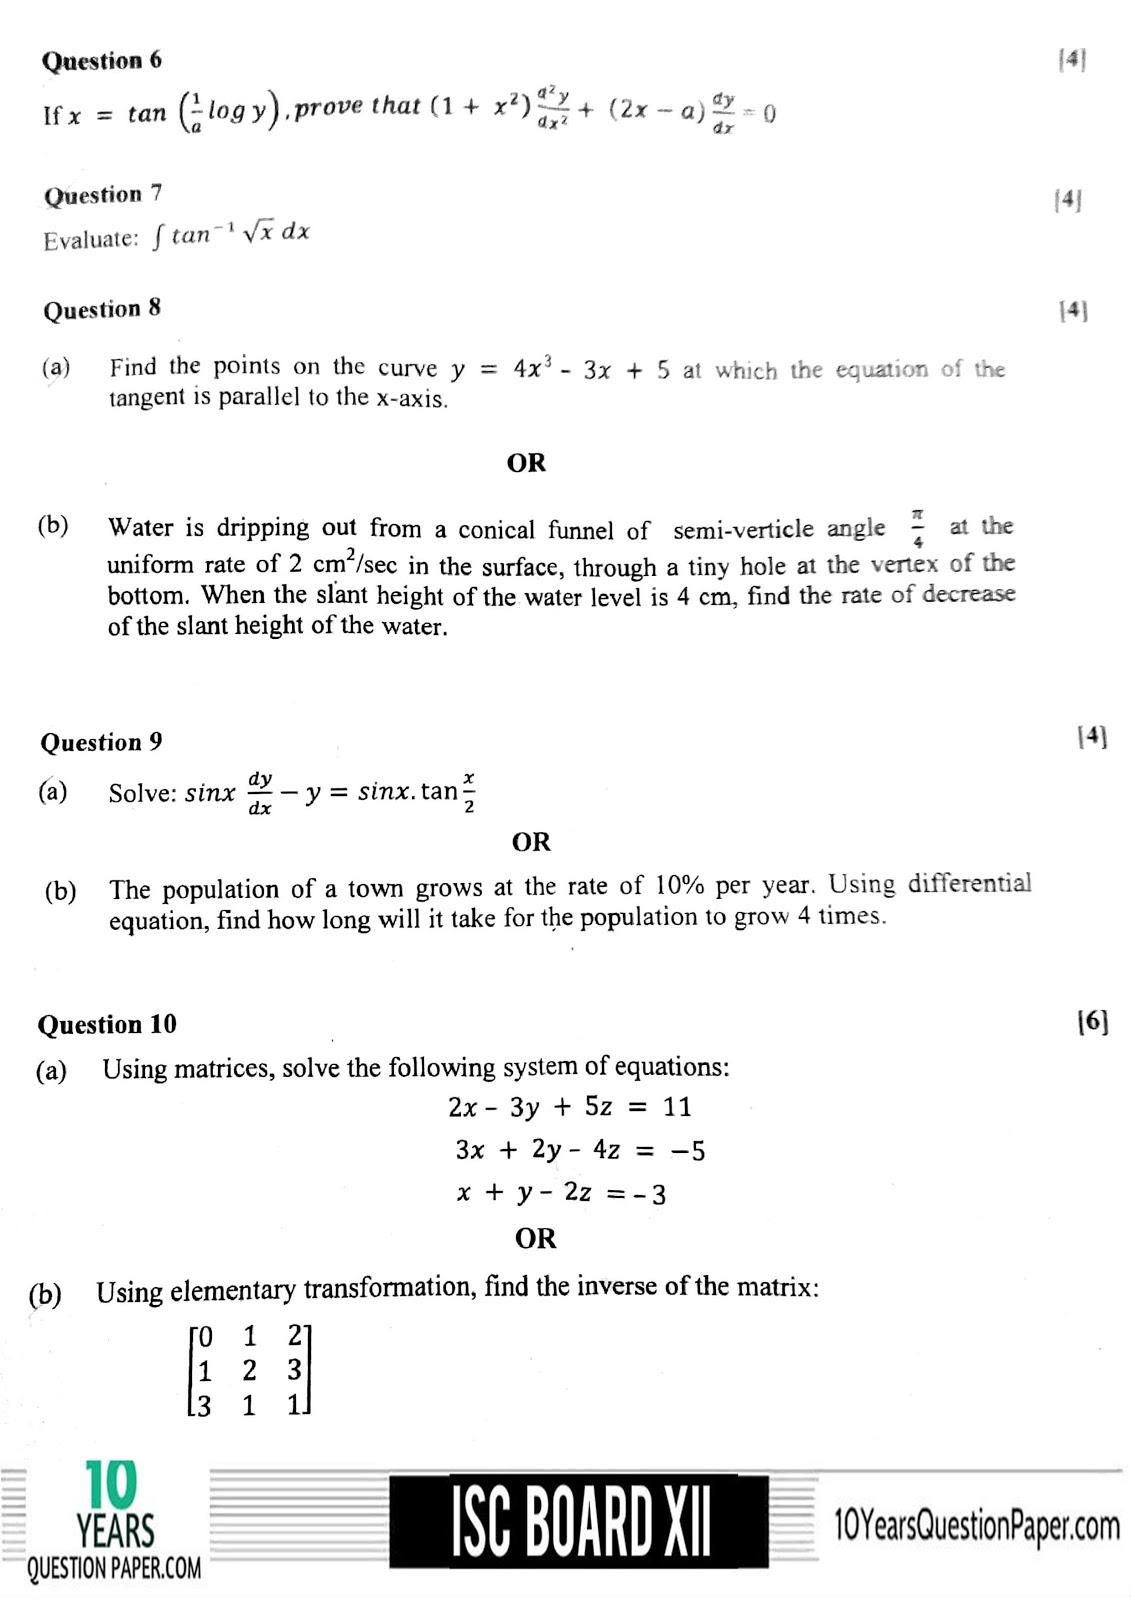 ISC Board 2018 class 12th Mathematics question paper Download PDF